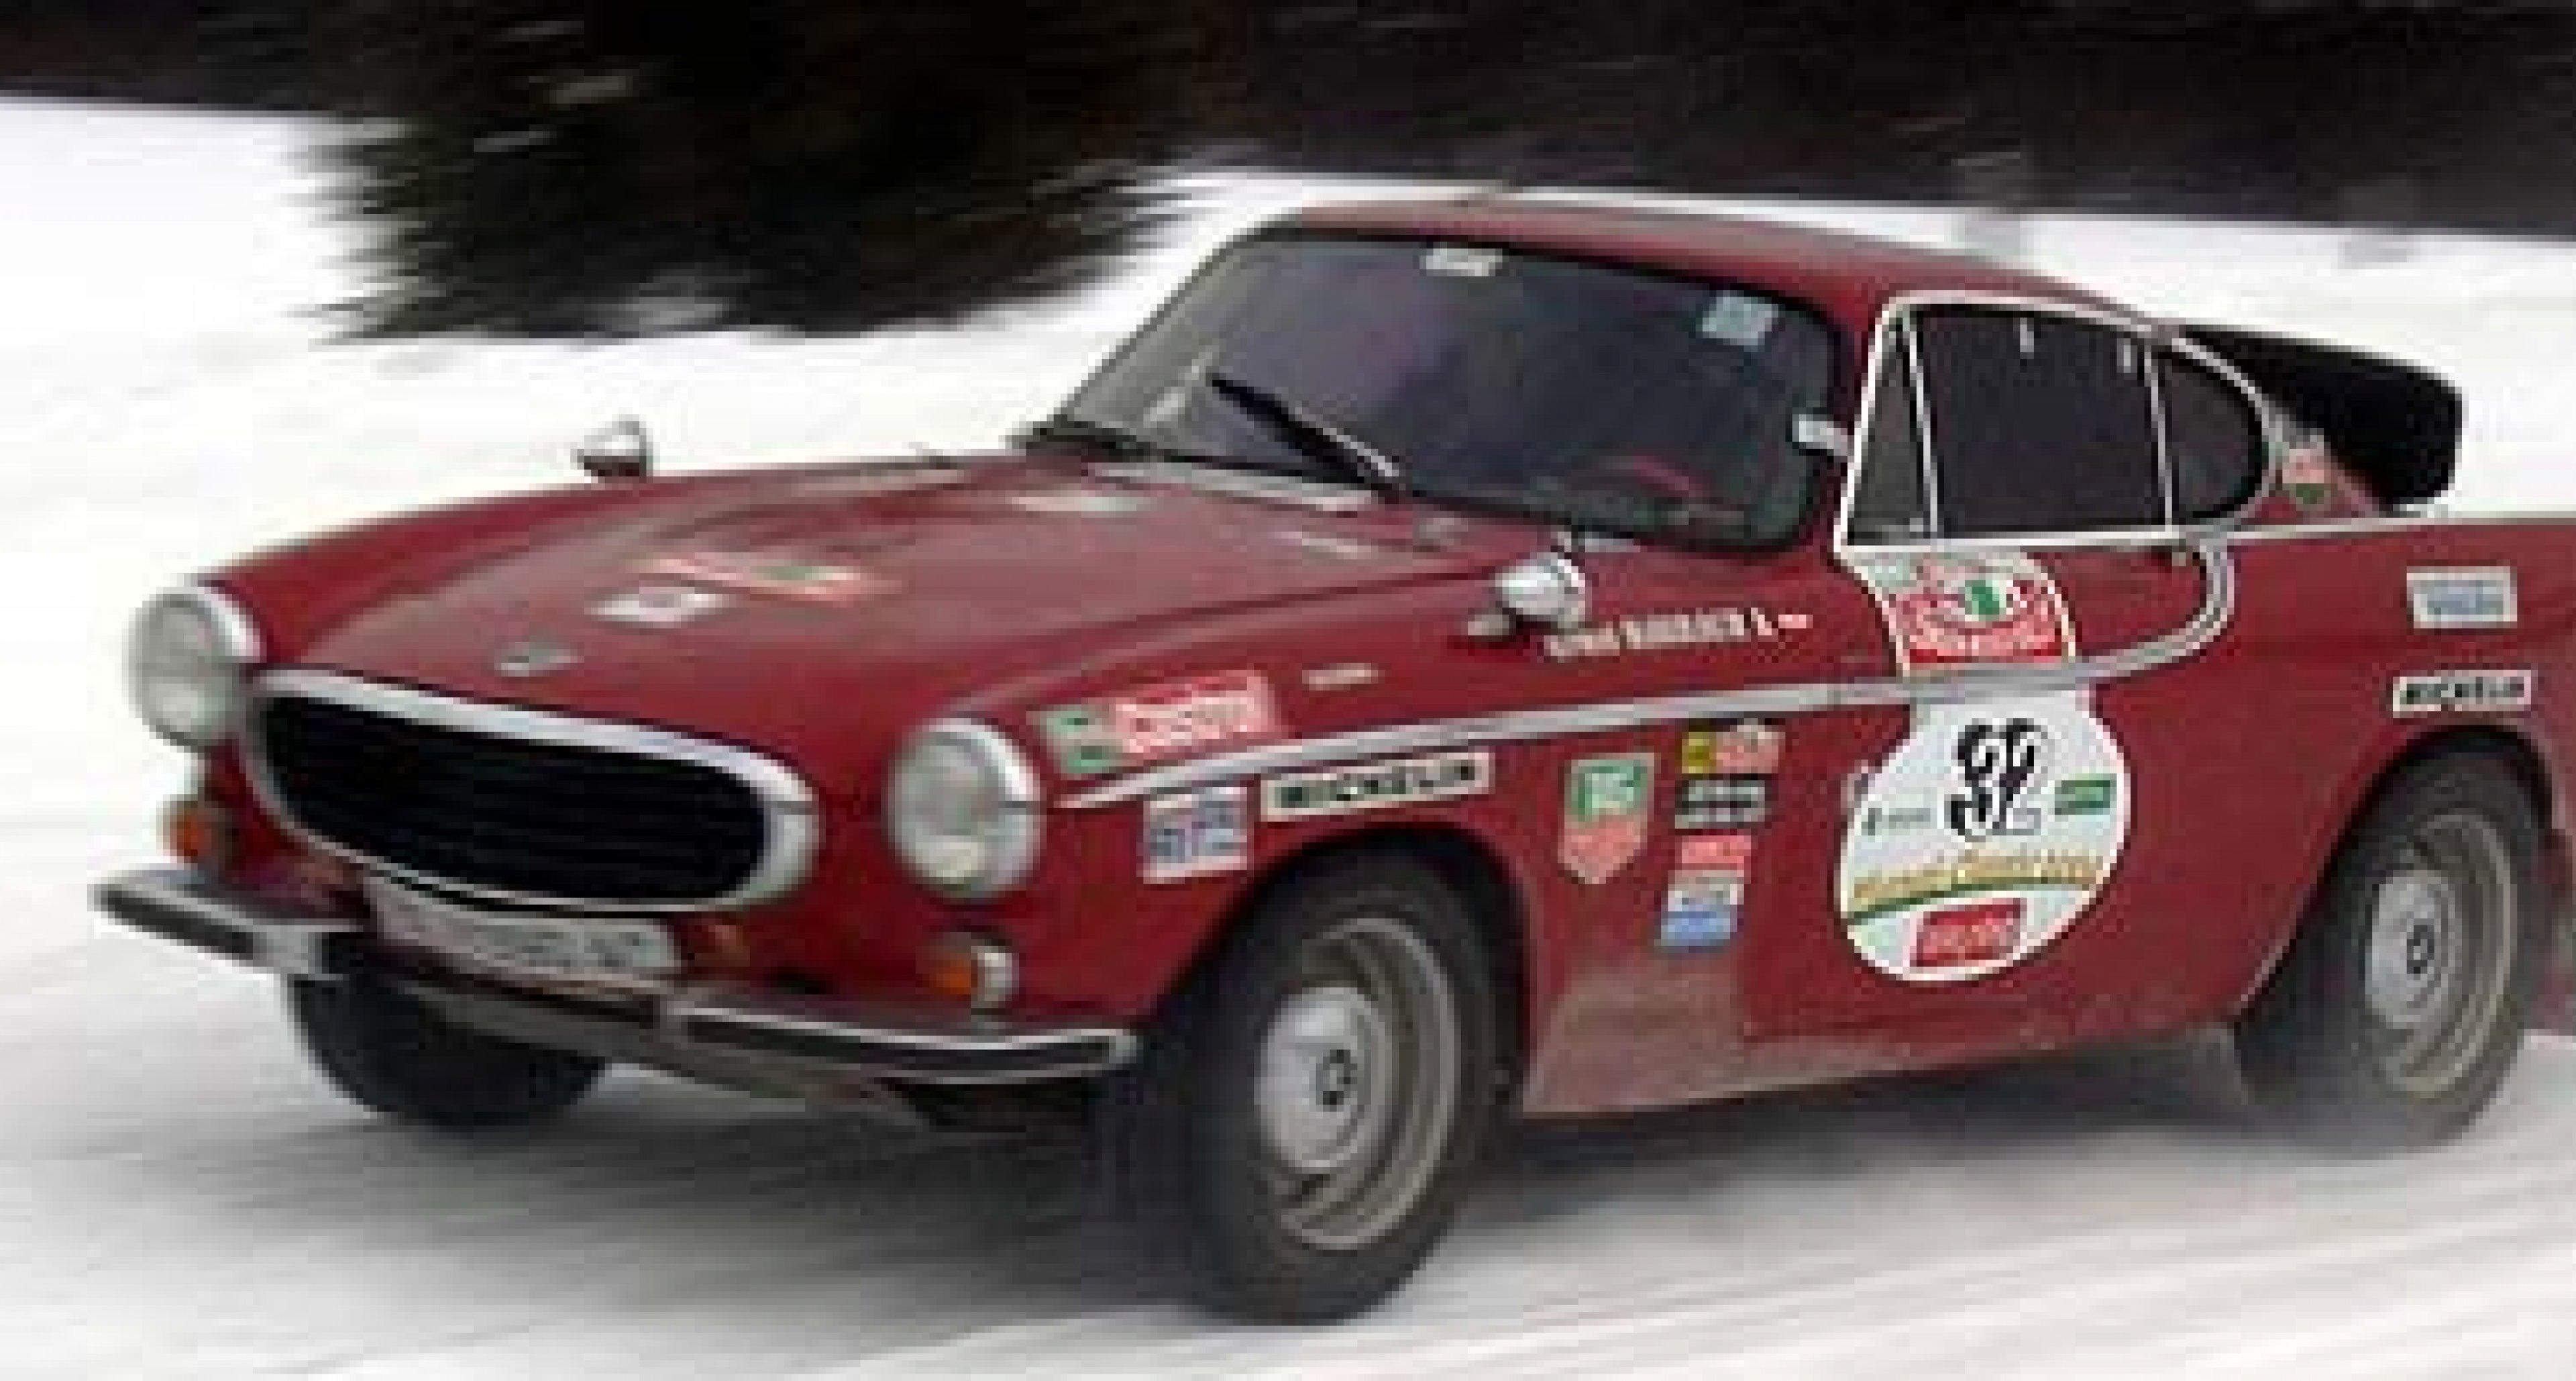 Planai-Classic 2004 – Die Oldtimer Rallye Saison hat begonnen